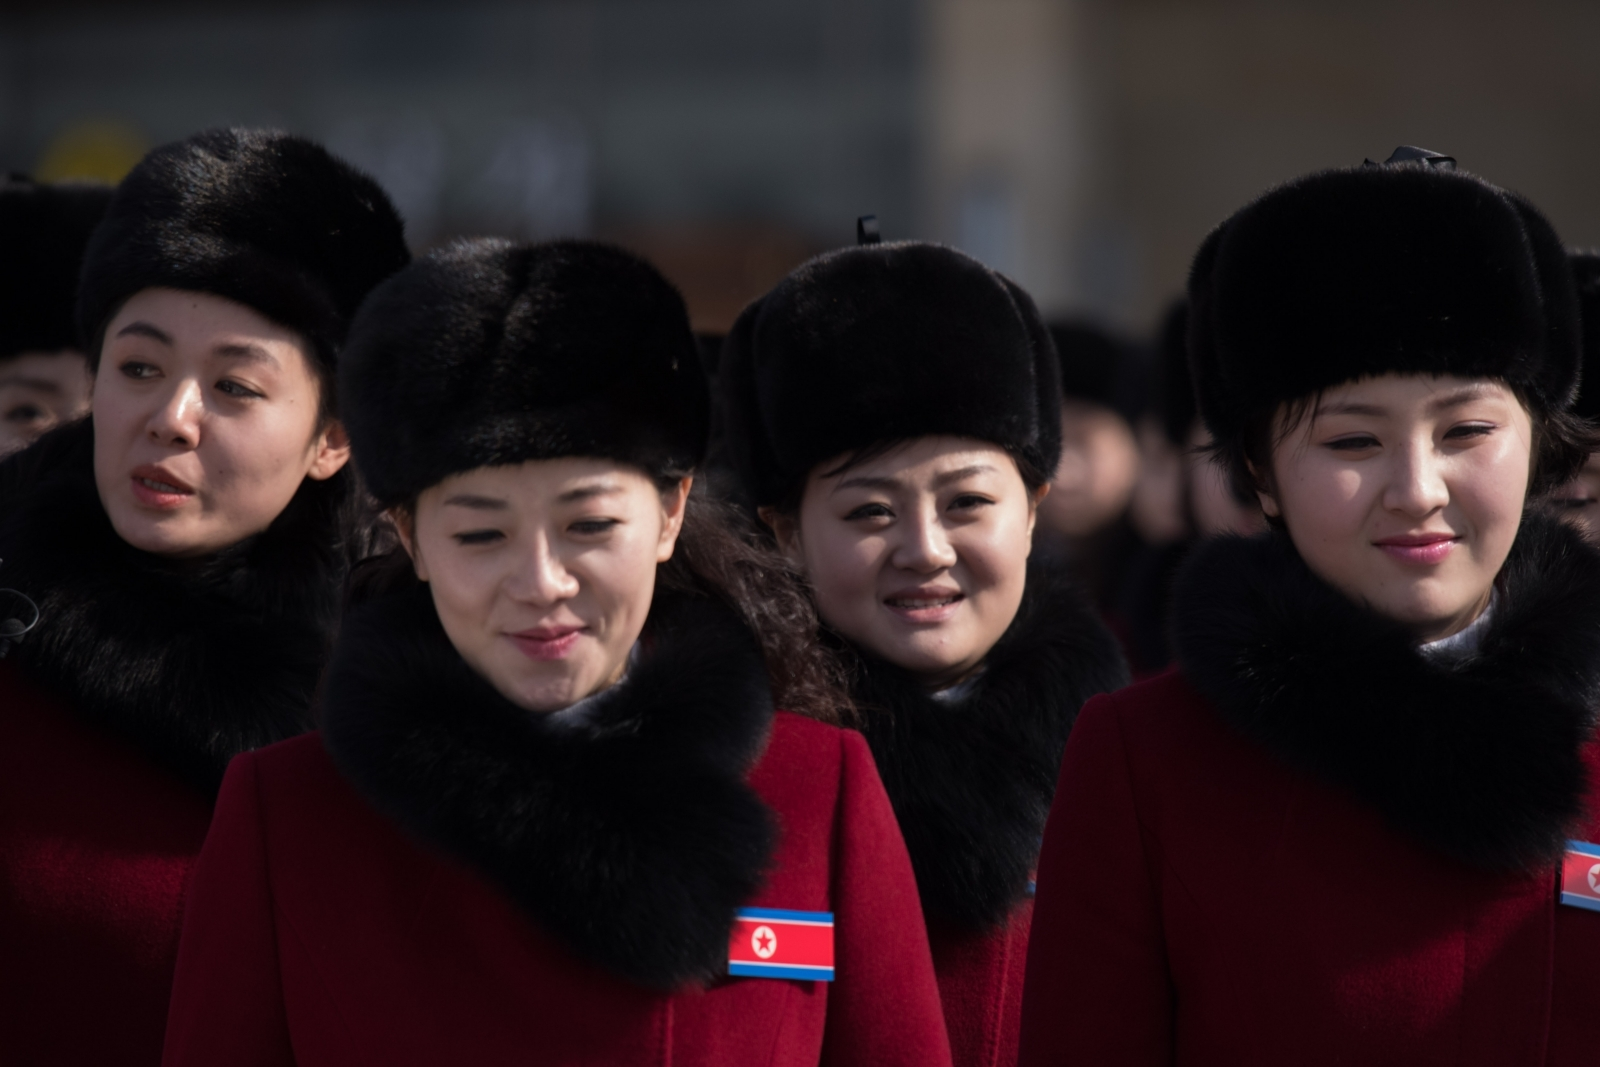 North Korean cheerleaders Winter Olympics 2018